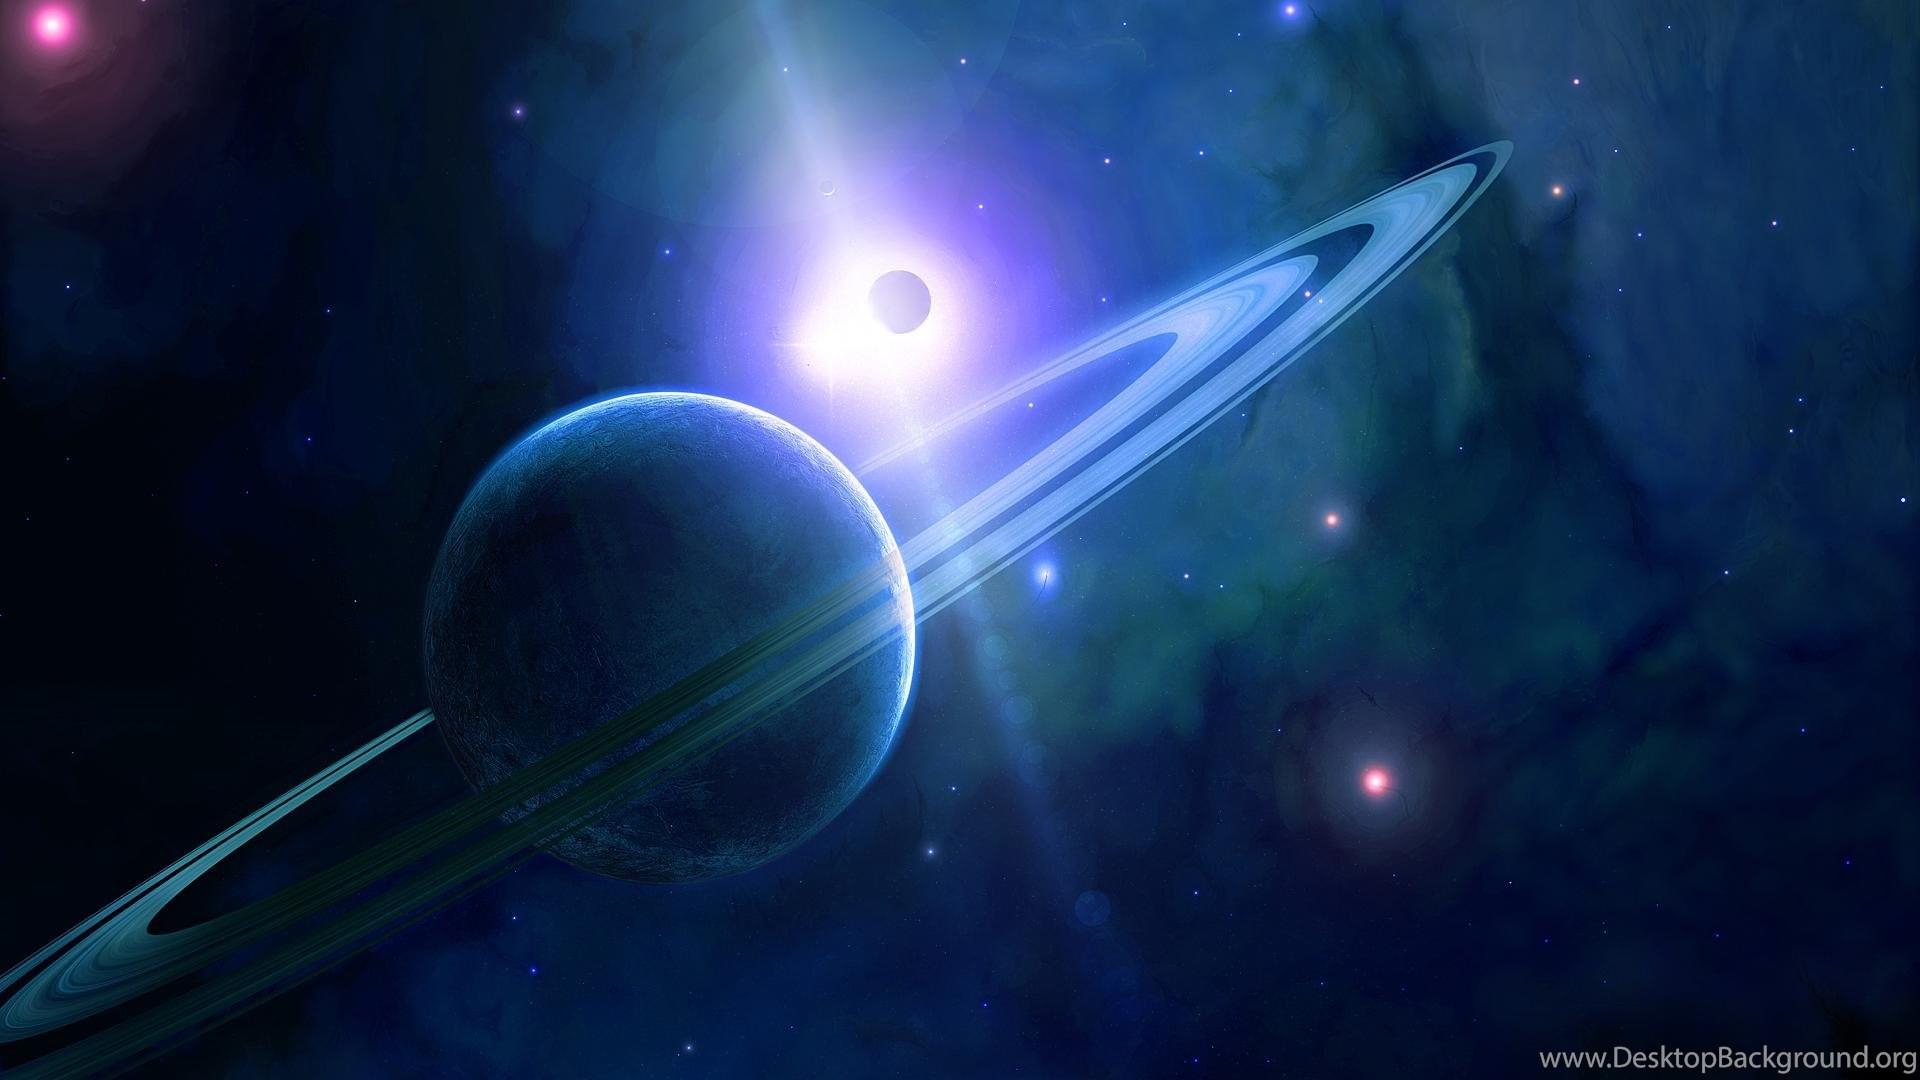 Desktop Hd Pictures Of The Planet Uranus Background